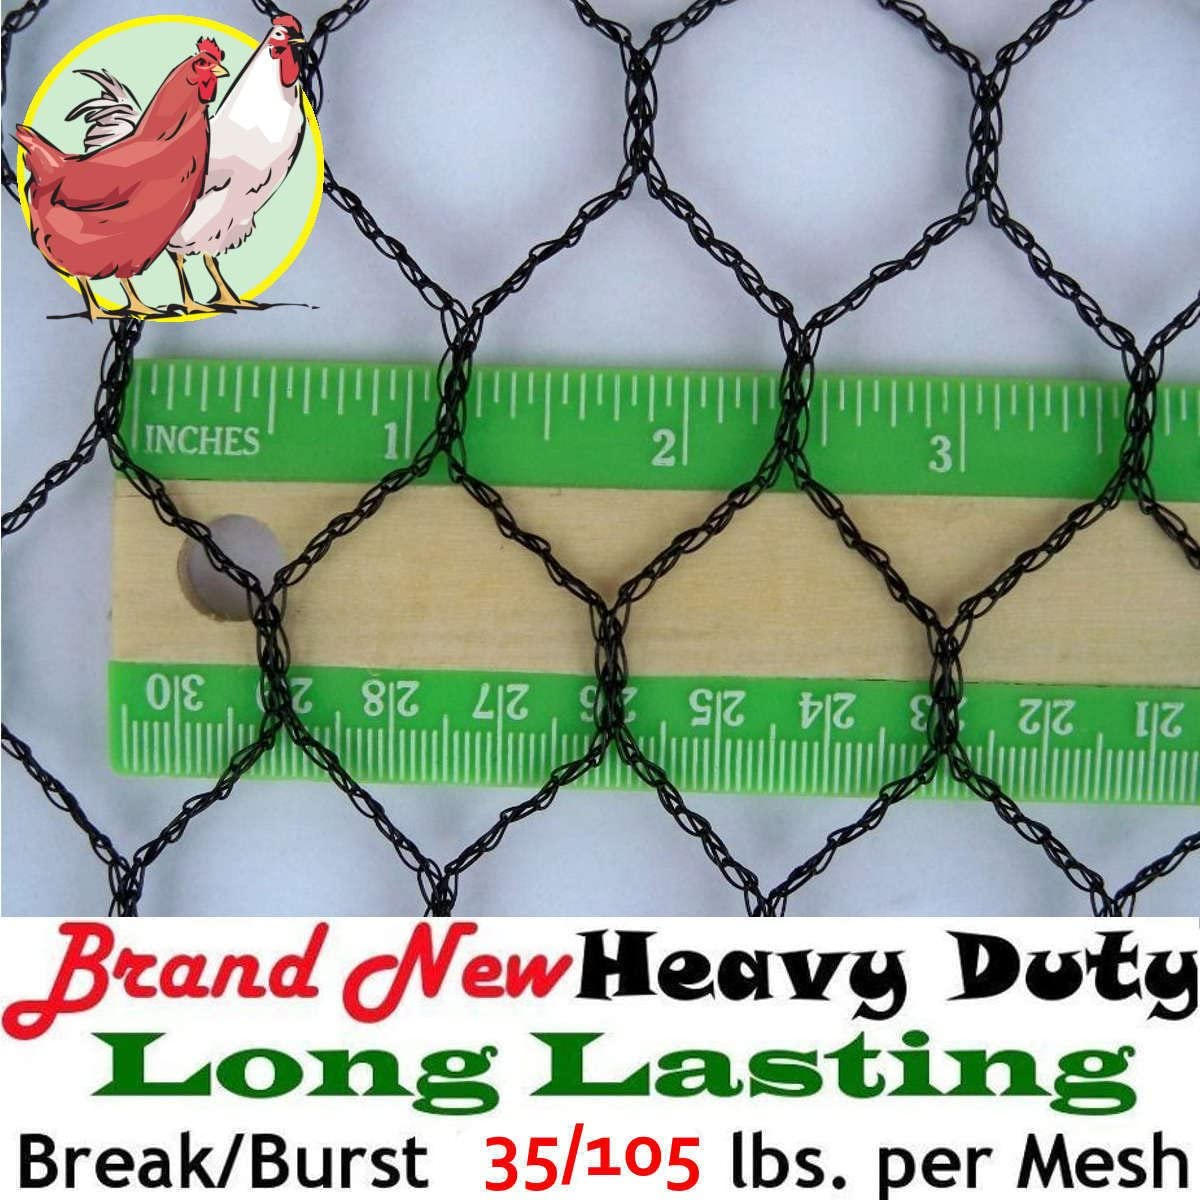 Pinnon Hatch Farms 1 Light Knitted Netting 18.7 X 202 Poultry Plant Bird Aviary Fruit Garden Protection Net Nets – Break Burst 35 105 lbs. per mesh